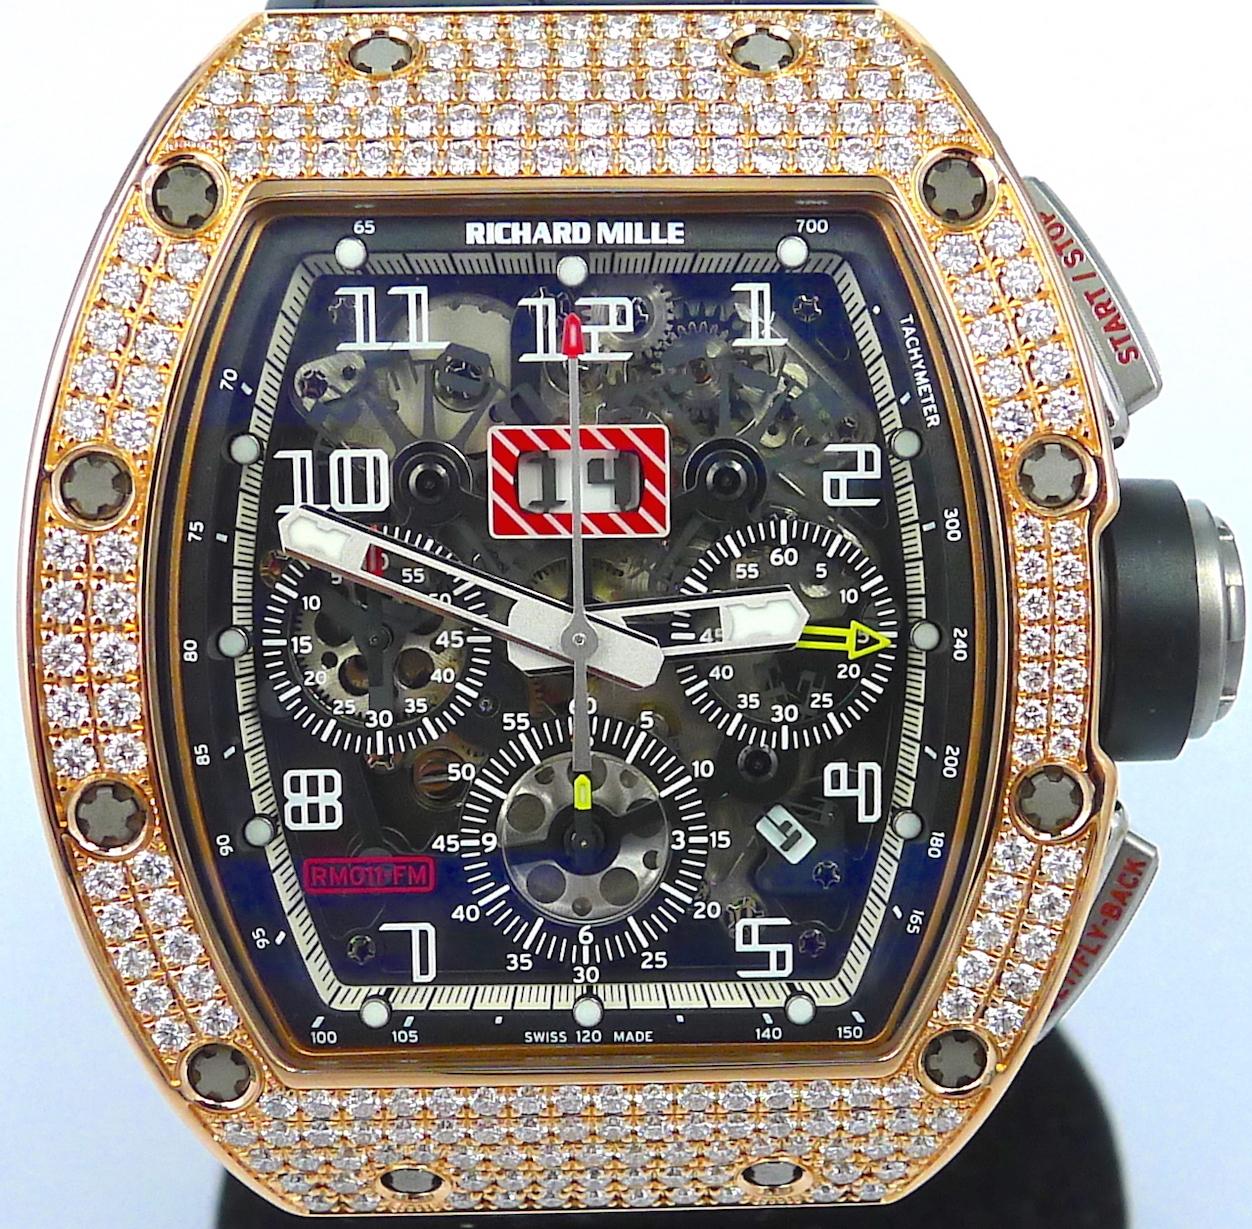 Richard Mille Rm011 Rose Gold Diamond Flyback Chronograph